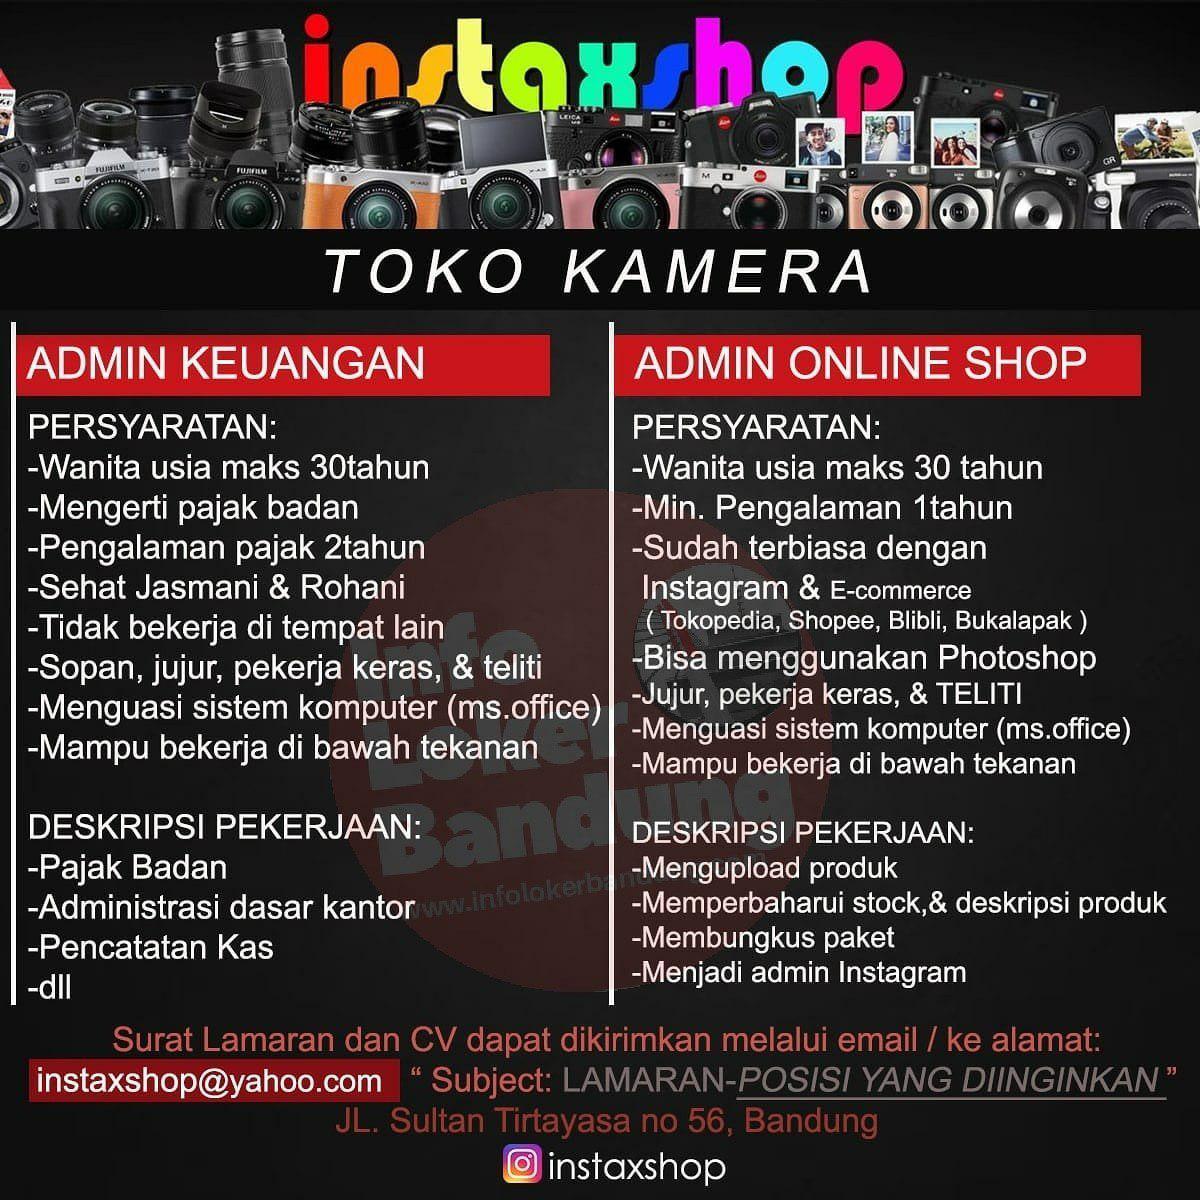 Lowongan Kerja Instaxshop Toko Kamera Bandung Januari 2019